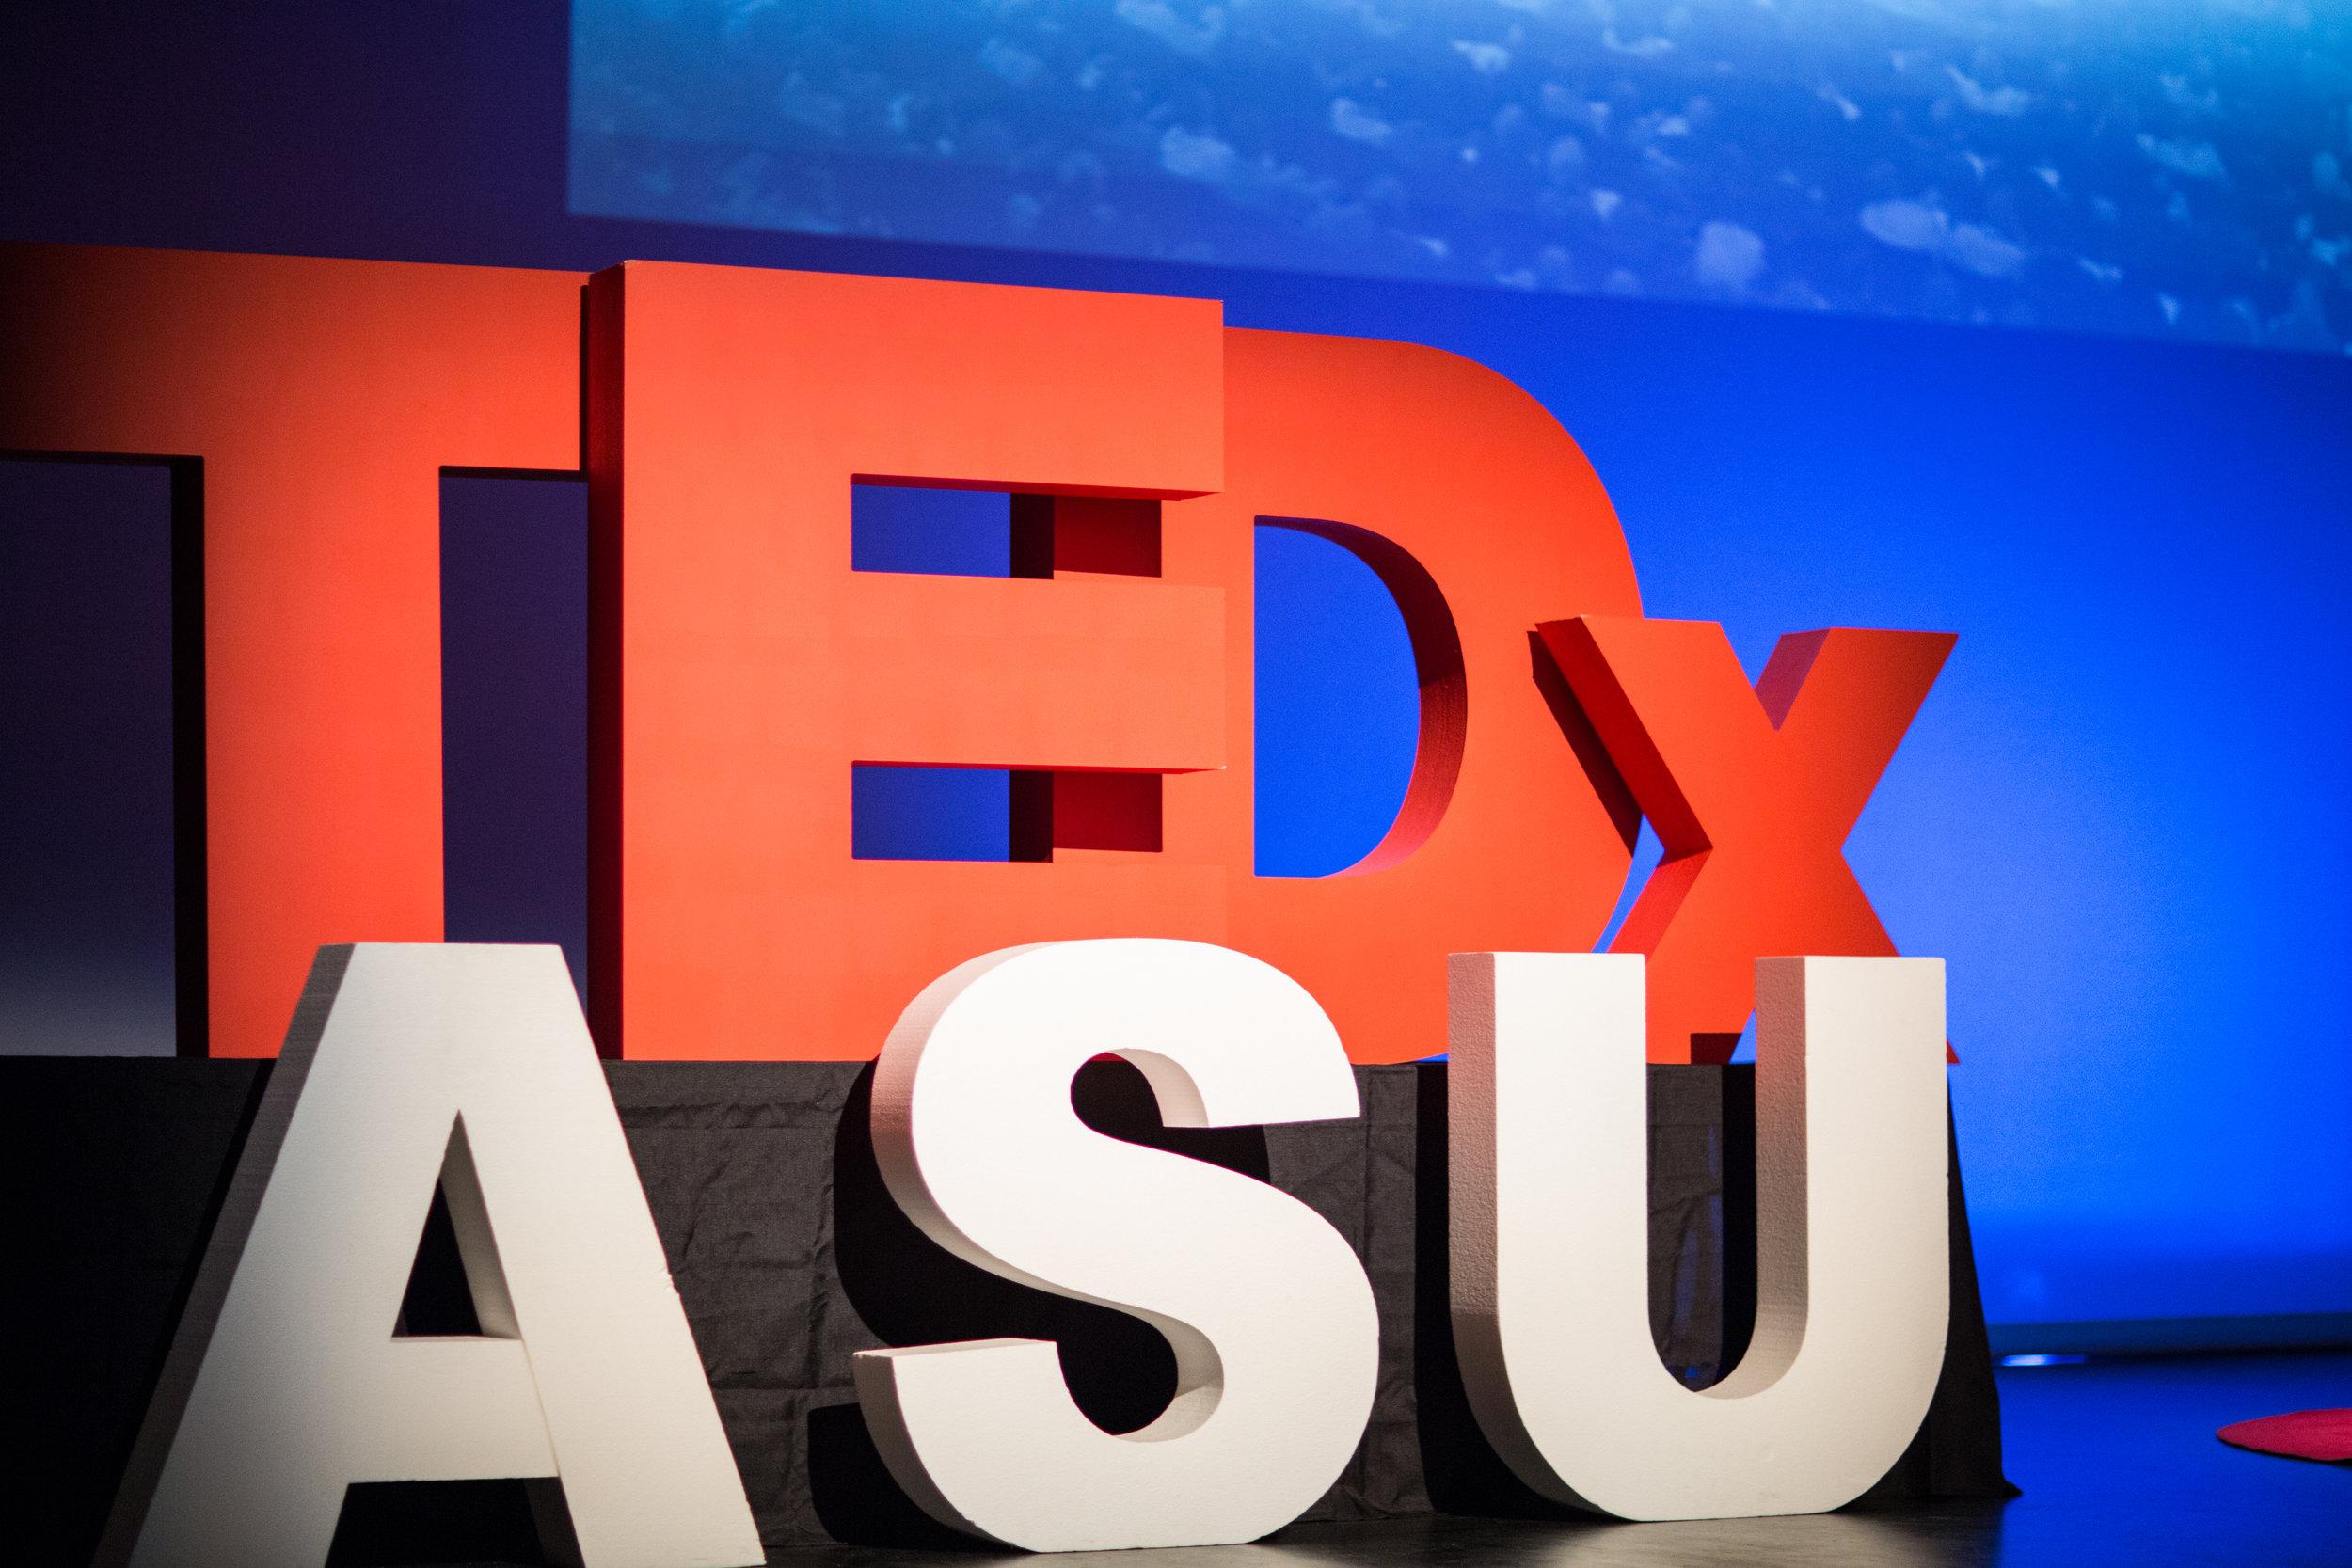 TEDxASU2019-383.jpg